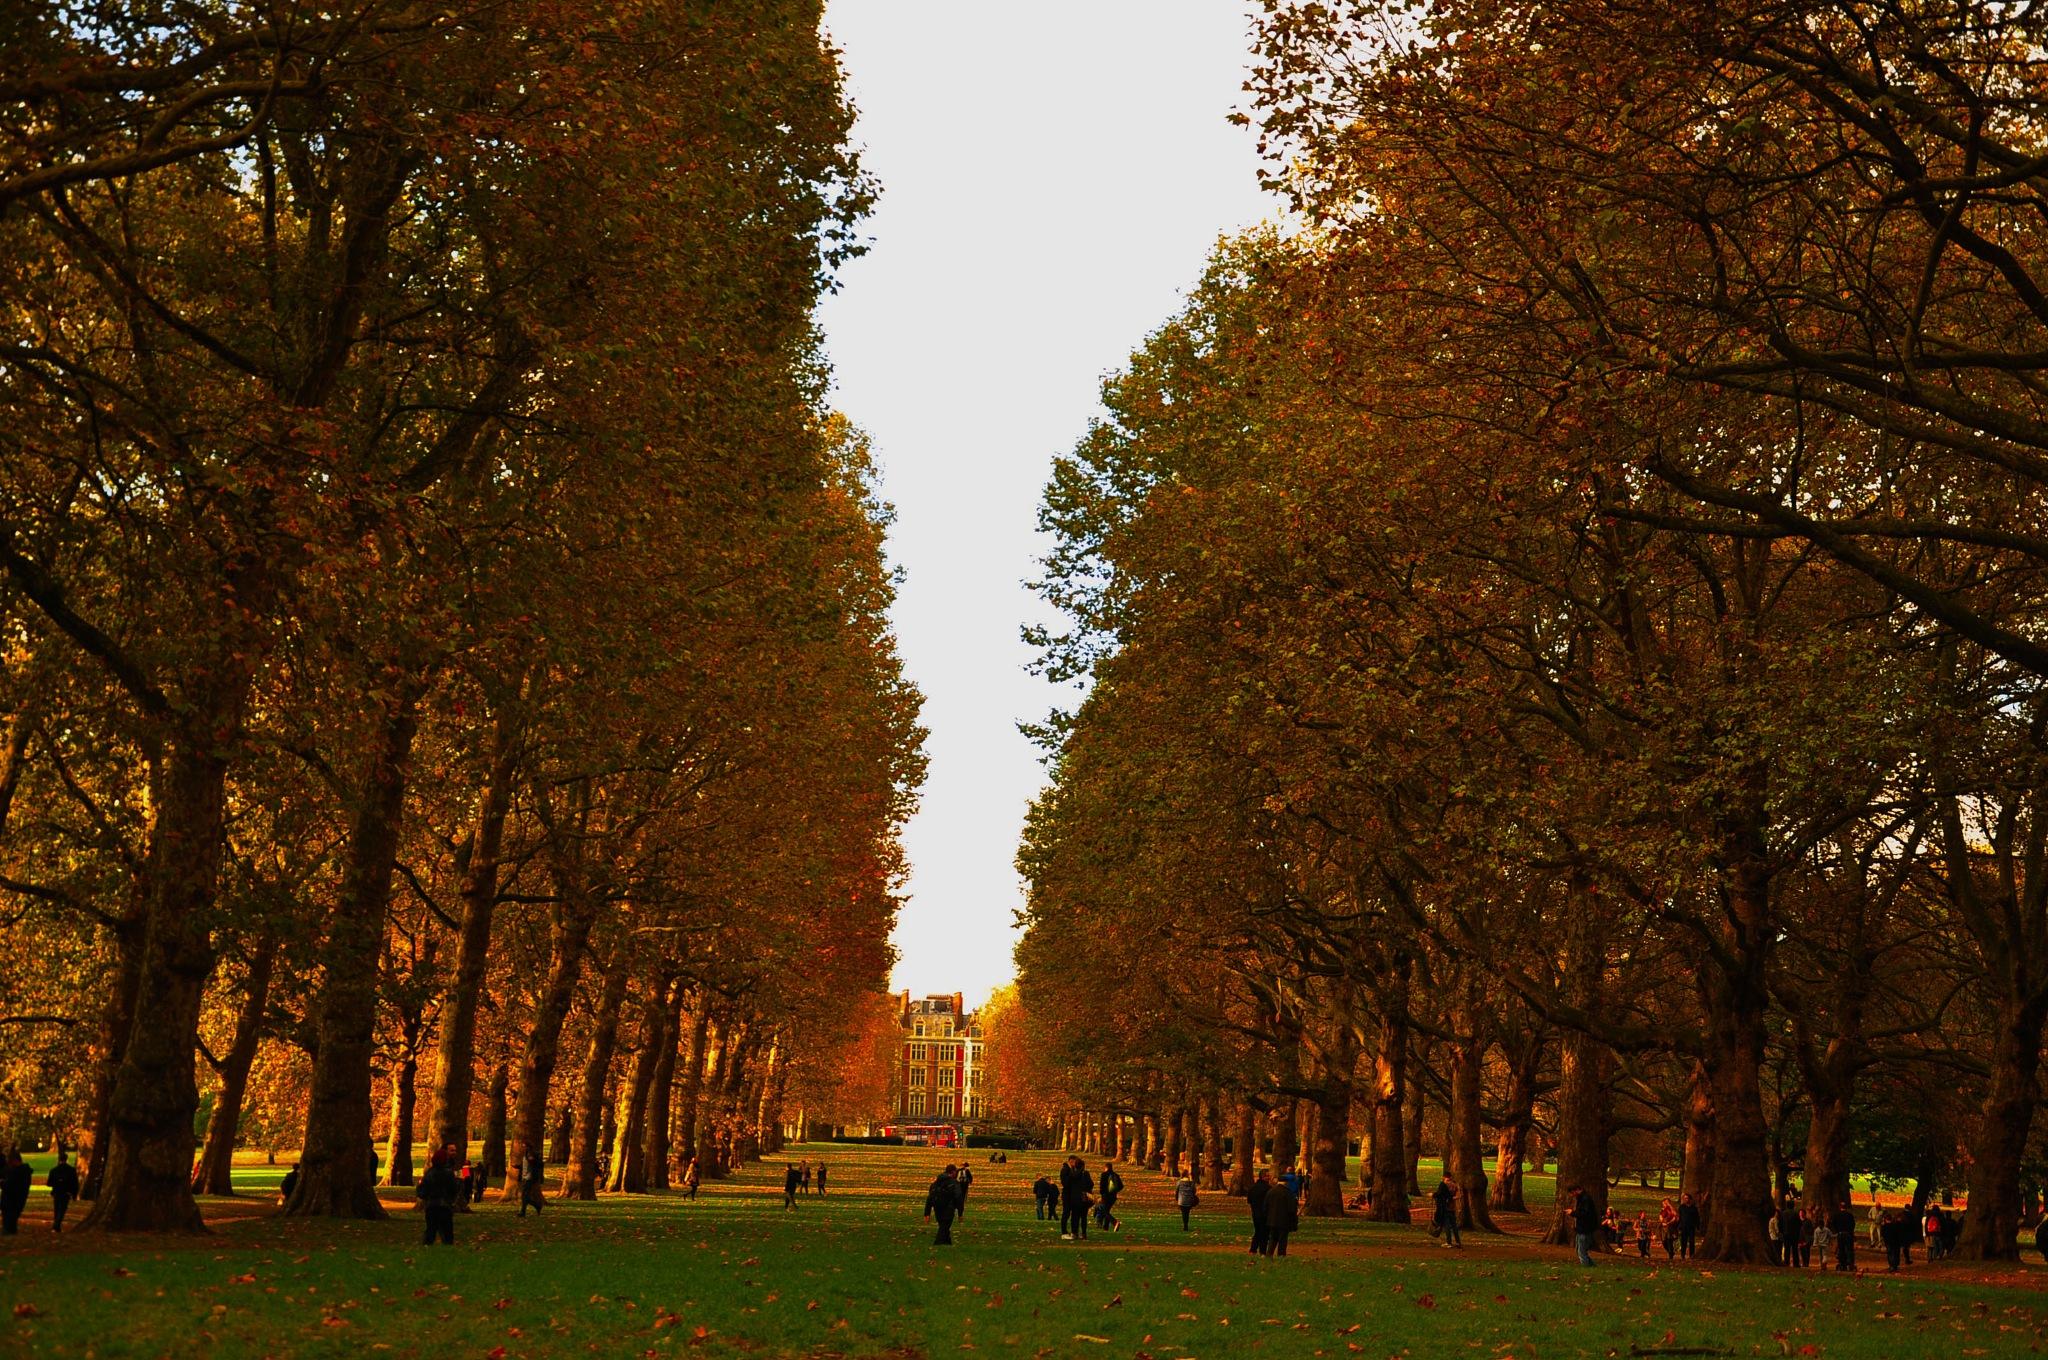 Green Park by Ali Bahceli